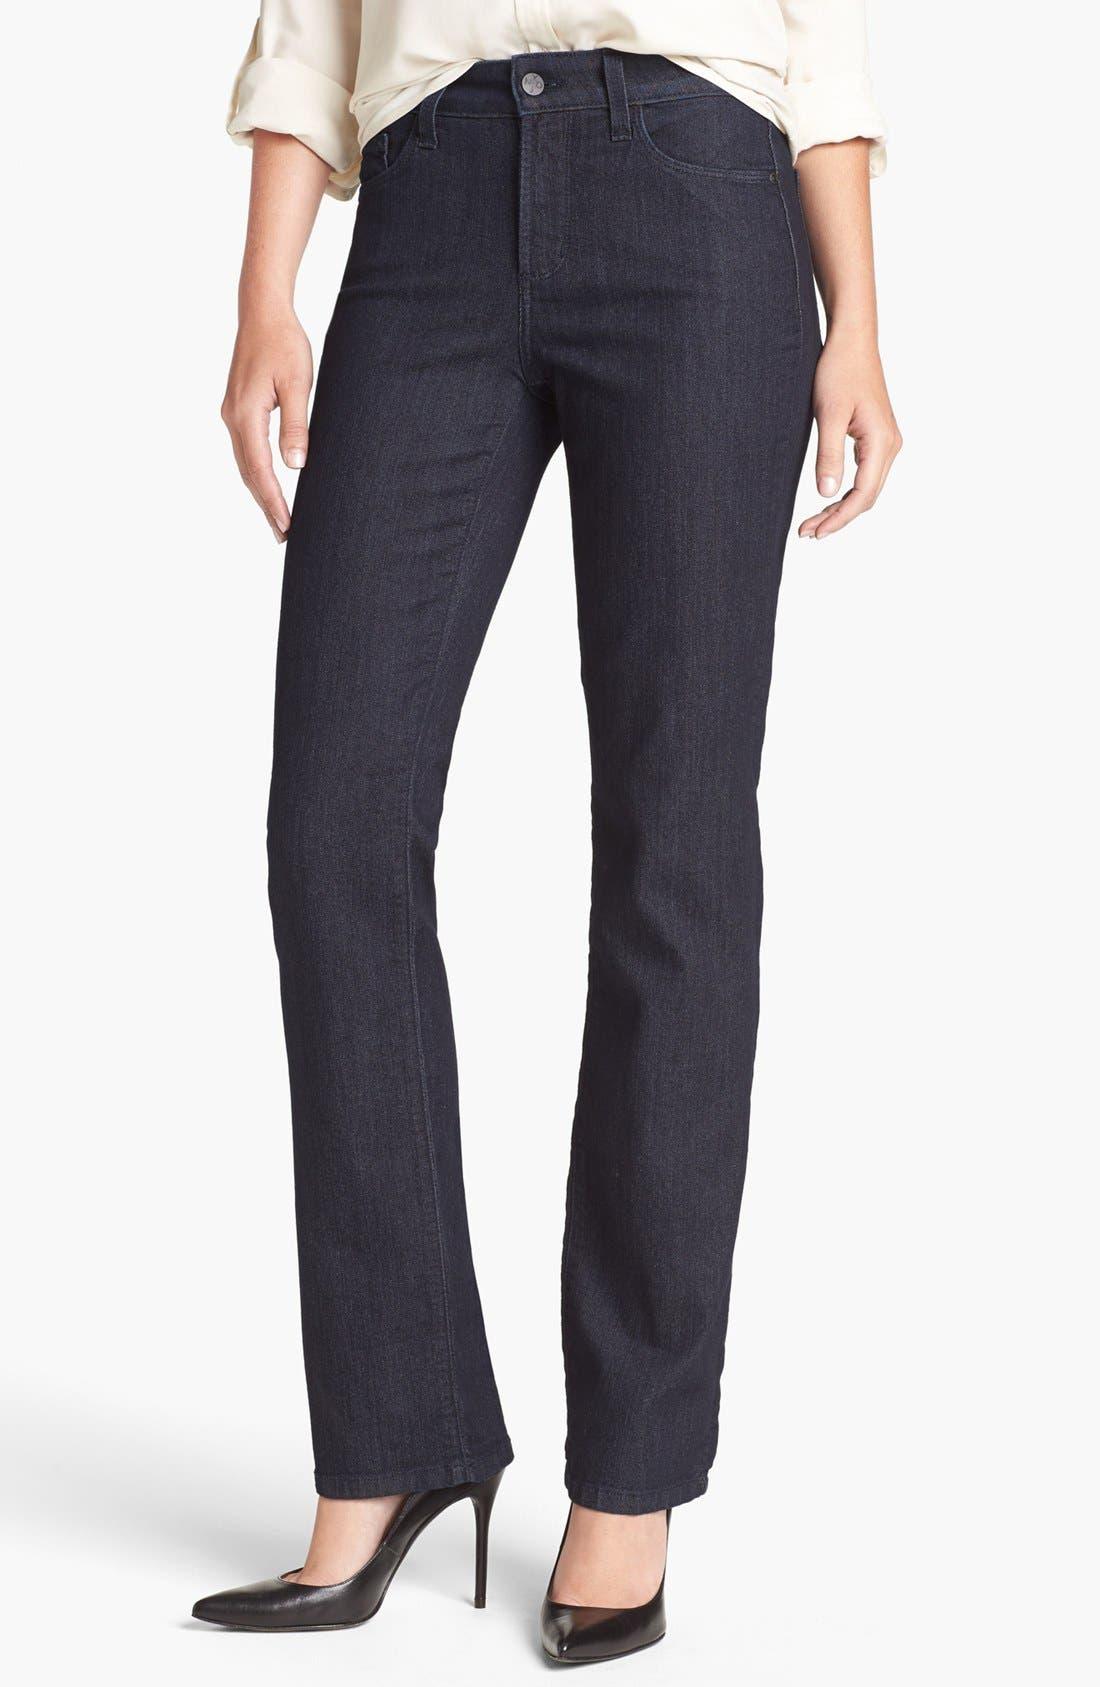 Alternate Image 1 Selected - NYDJ 'Marilyn' Embellished Pocket Straight Leg Jeans